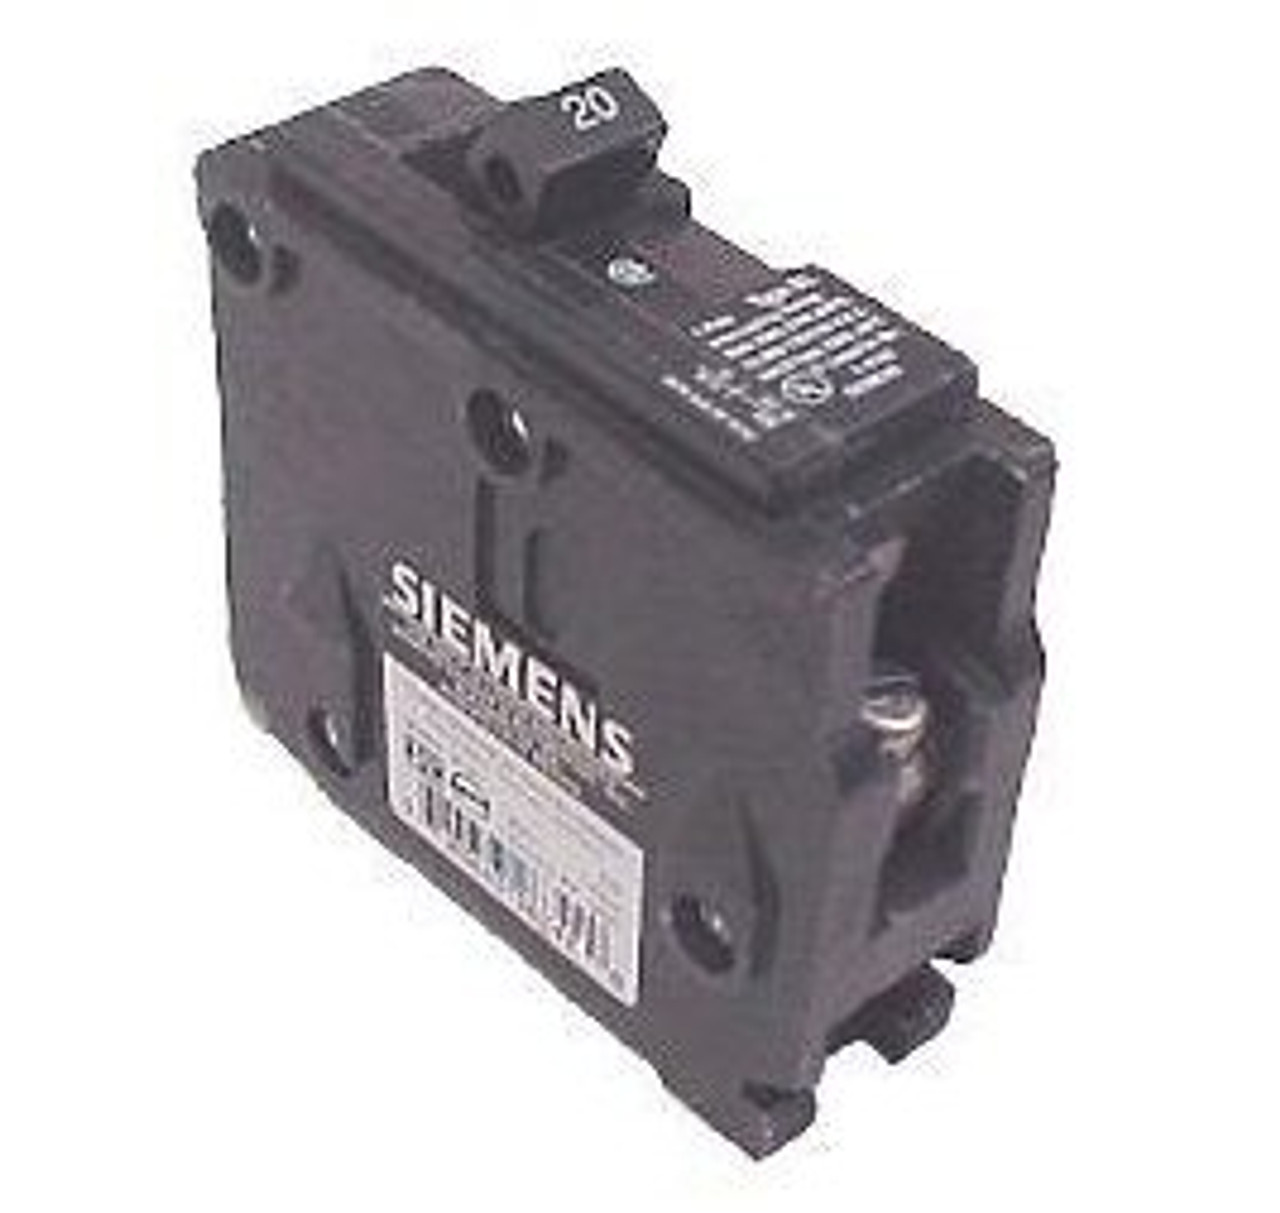 Siemens B120H00S01 1 Pole 20 Amp 120V 22K Shunt Trip Type BL Circuit Breaker - Used